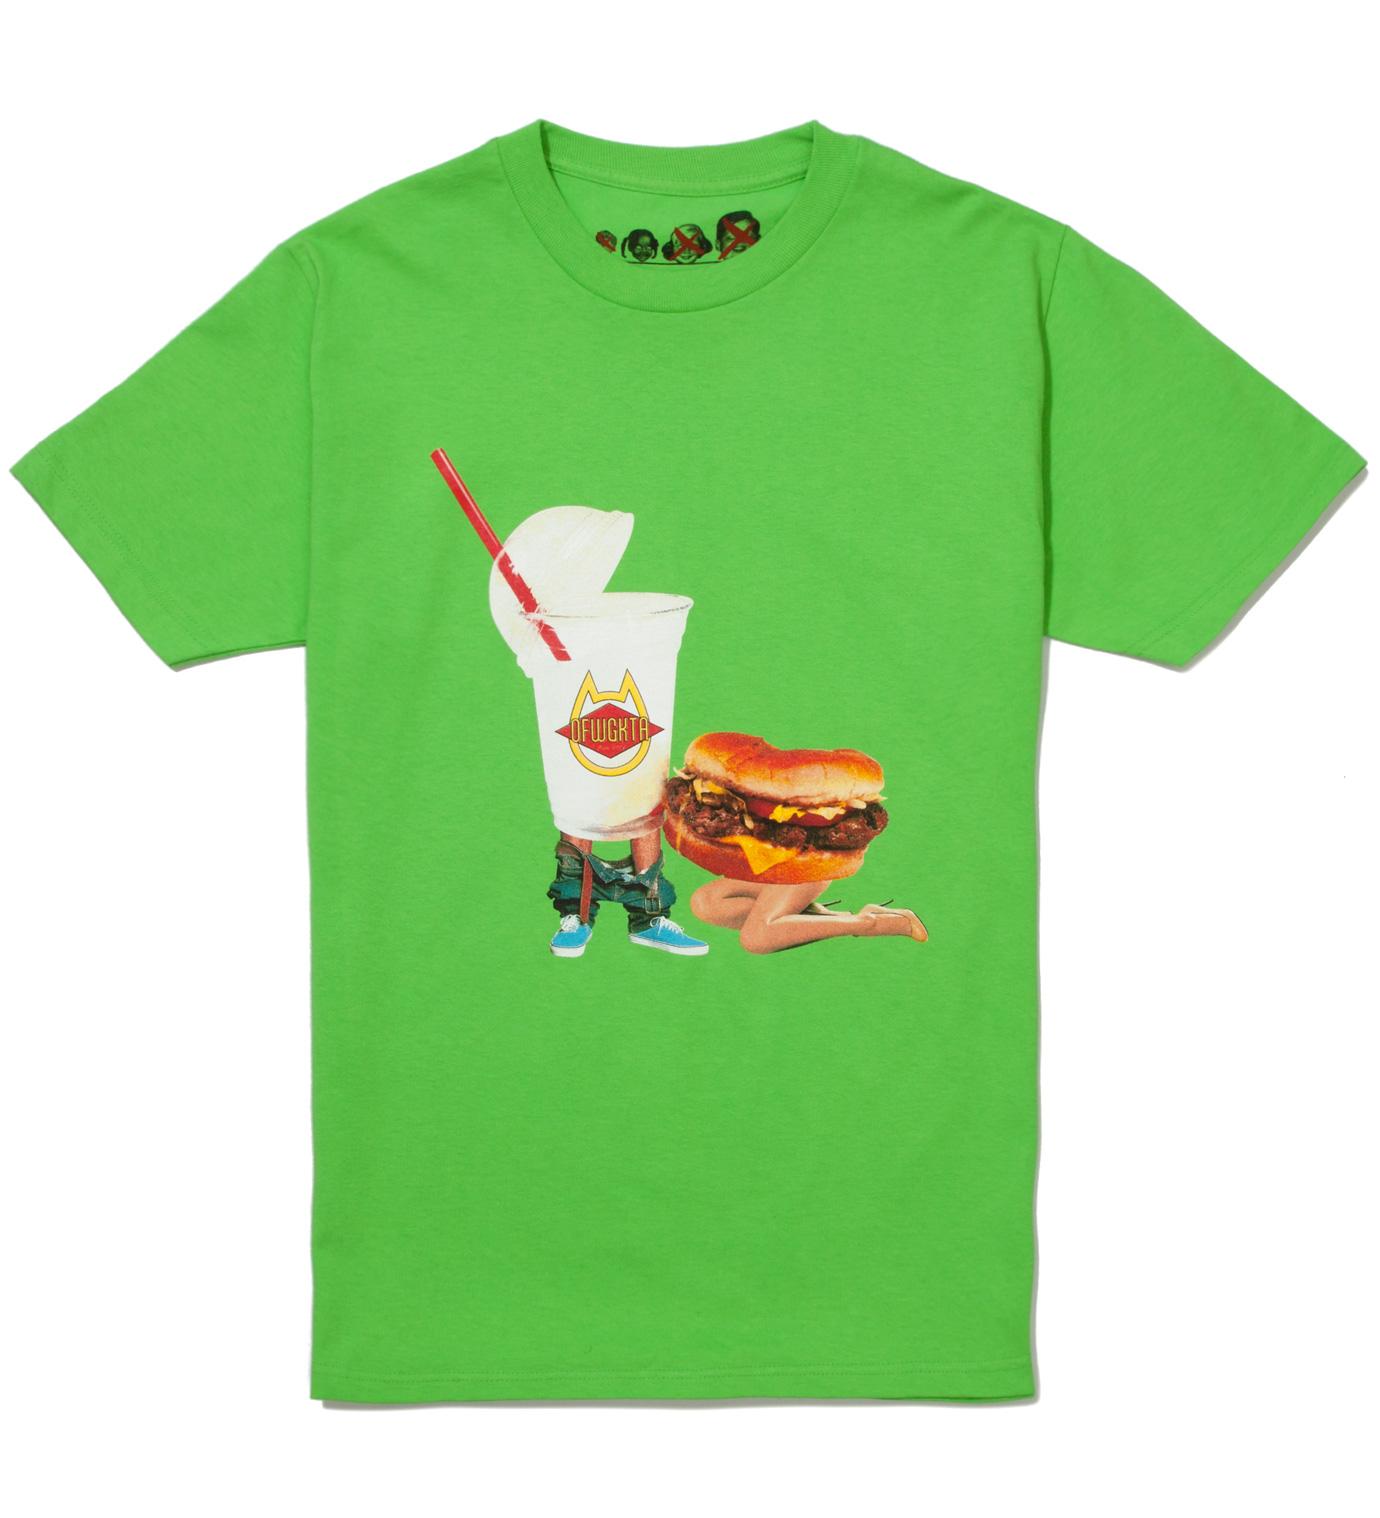 Odd Future Lime Green Milkshake Head Summer 2012 T-Shirt